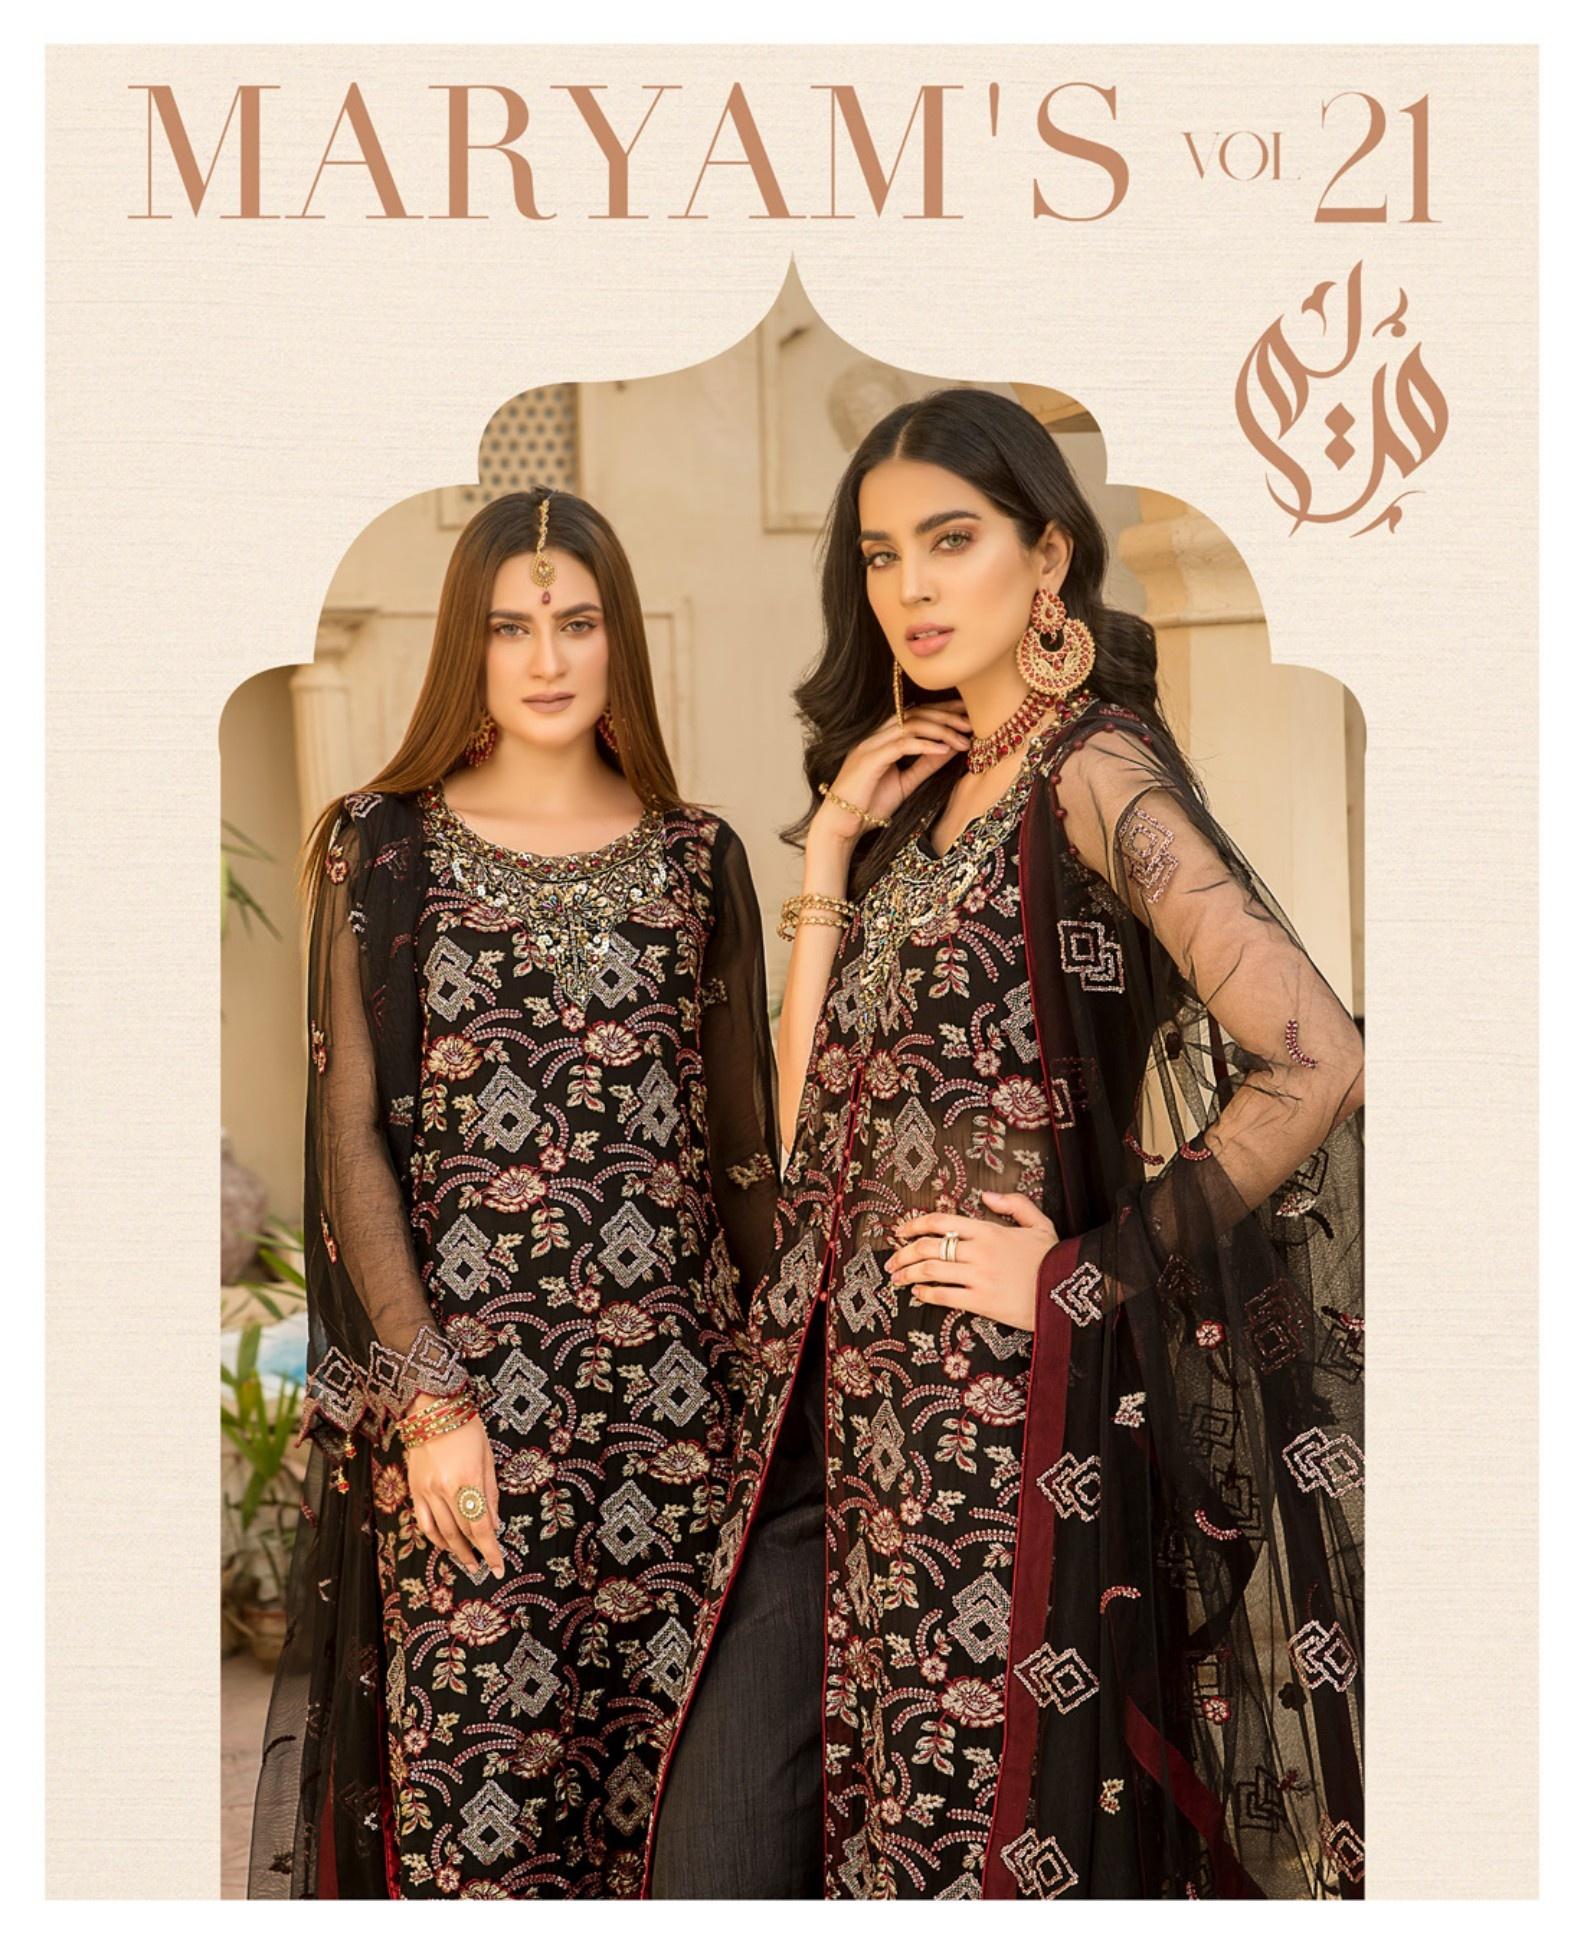 Maryam Vol 21